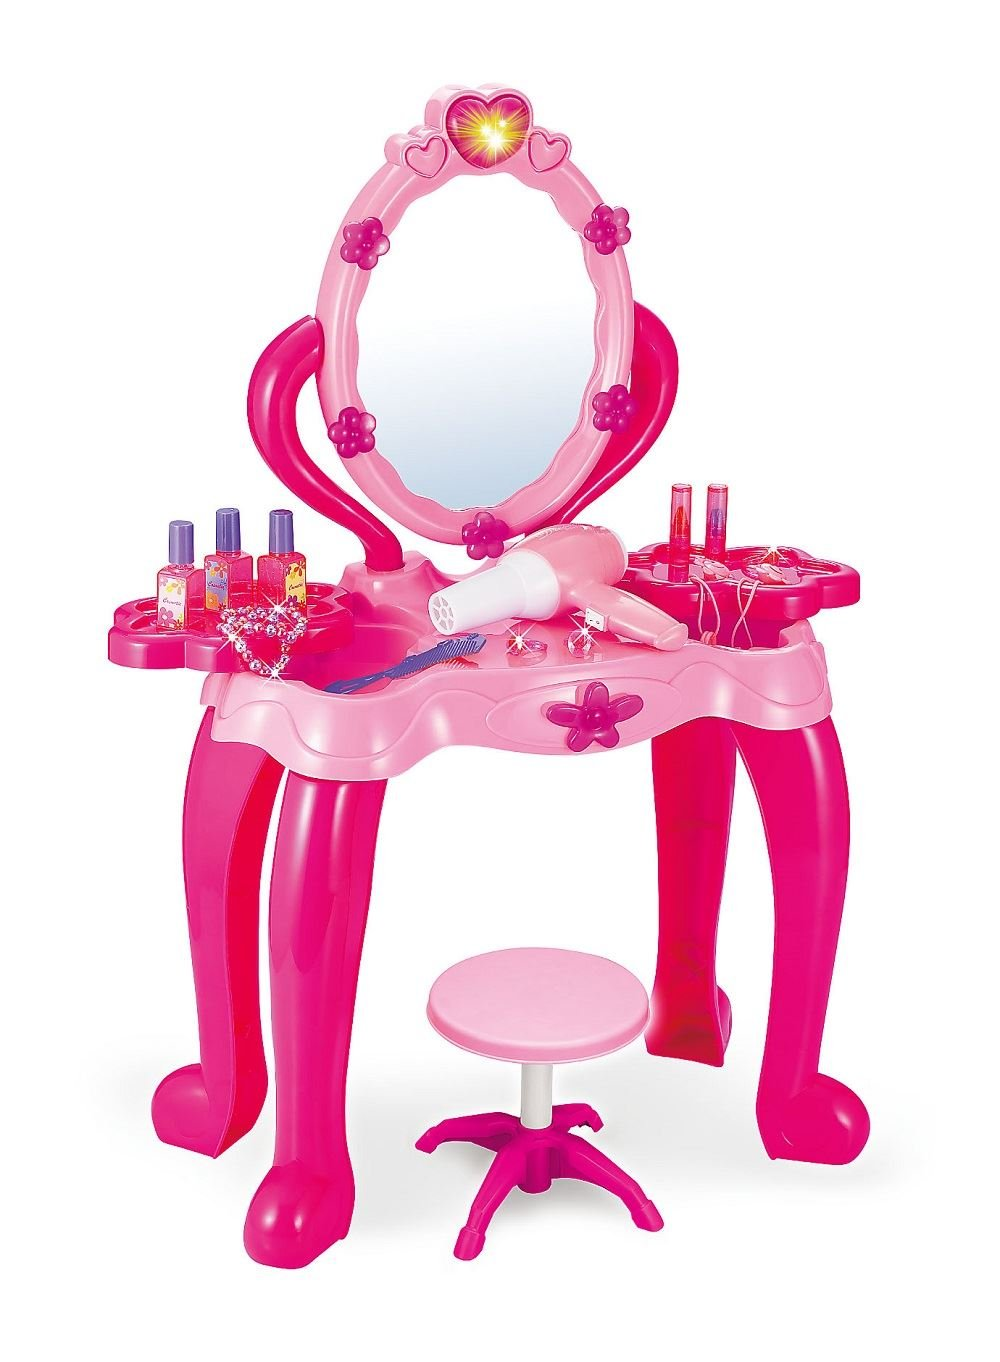 Vinsani Girls Princess Dressing Table Stool Play Set Features Vanity Light  U0026 Music: Amazon.co.uk: Toys U0026 Games